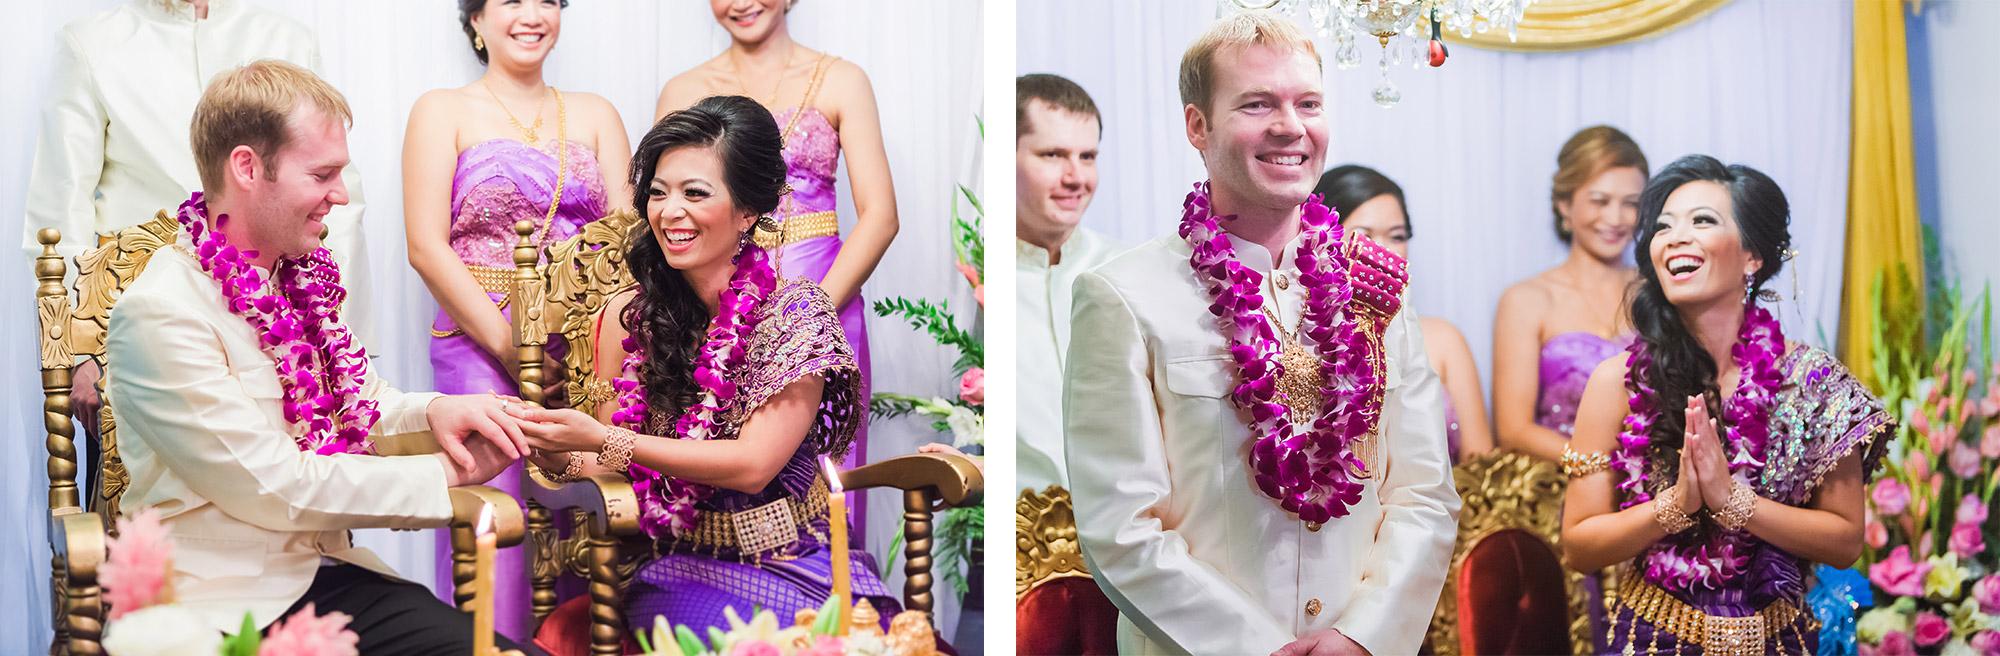 boston-cambodian-wedding-photographer-stephen-grant-photography-013.jpg